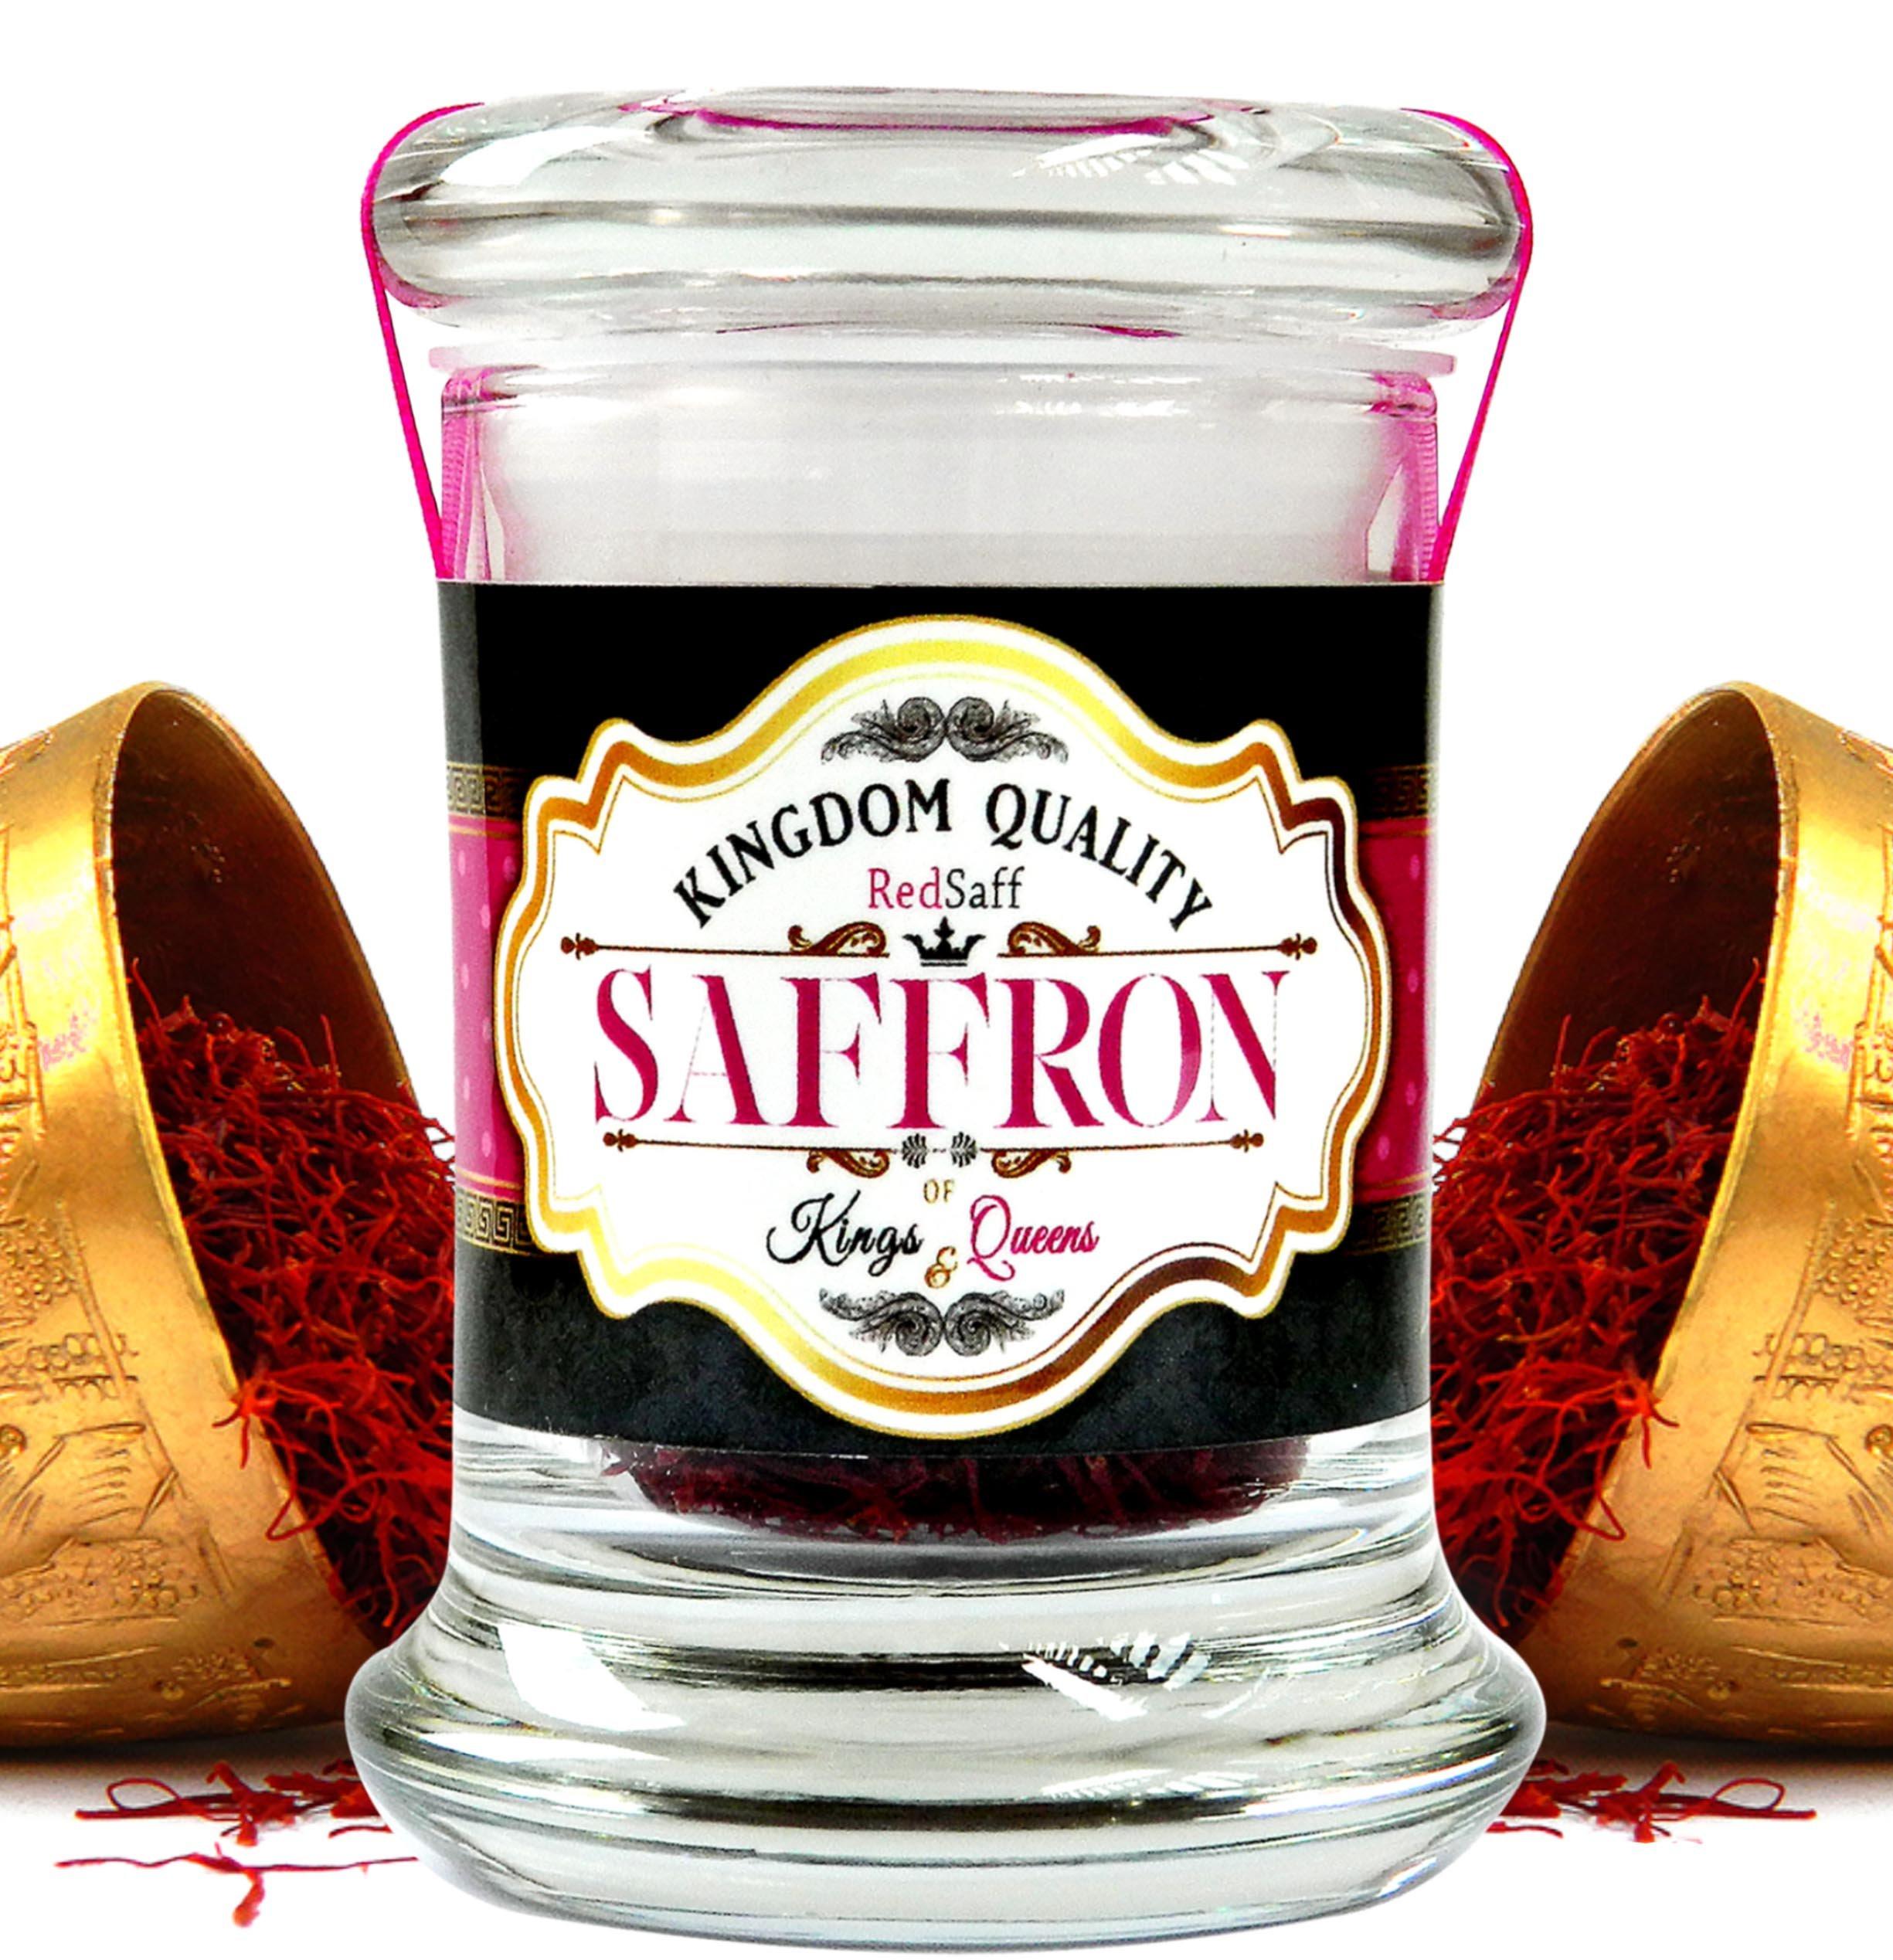 Afghan Saffron Threads (250 Average Color Reading) Kingdom Quality, All Red Premium Stigmas (0.176 once, 5 grams) by Redsaff Saffron (Image #1)